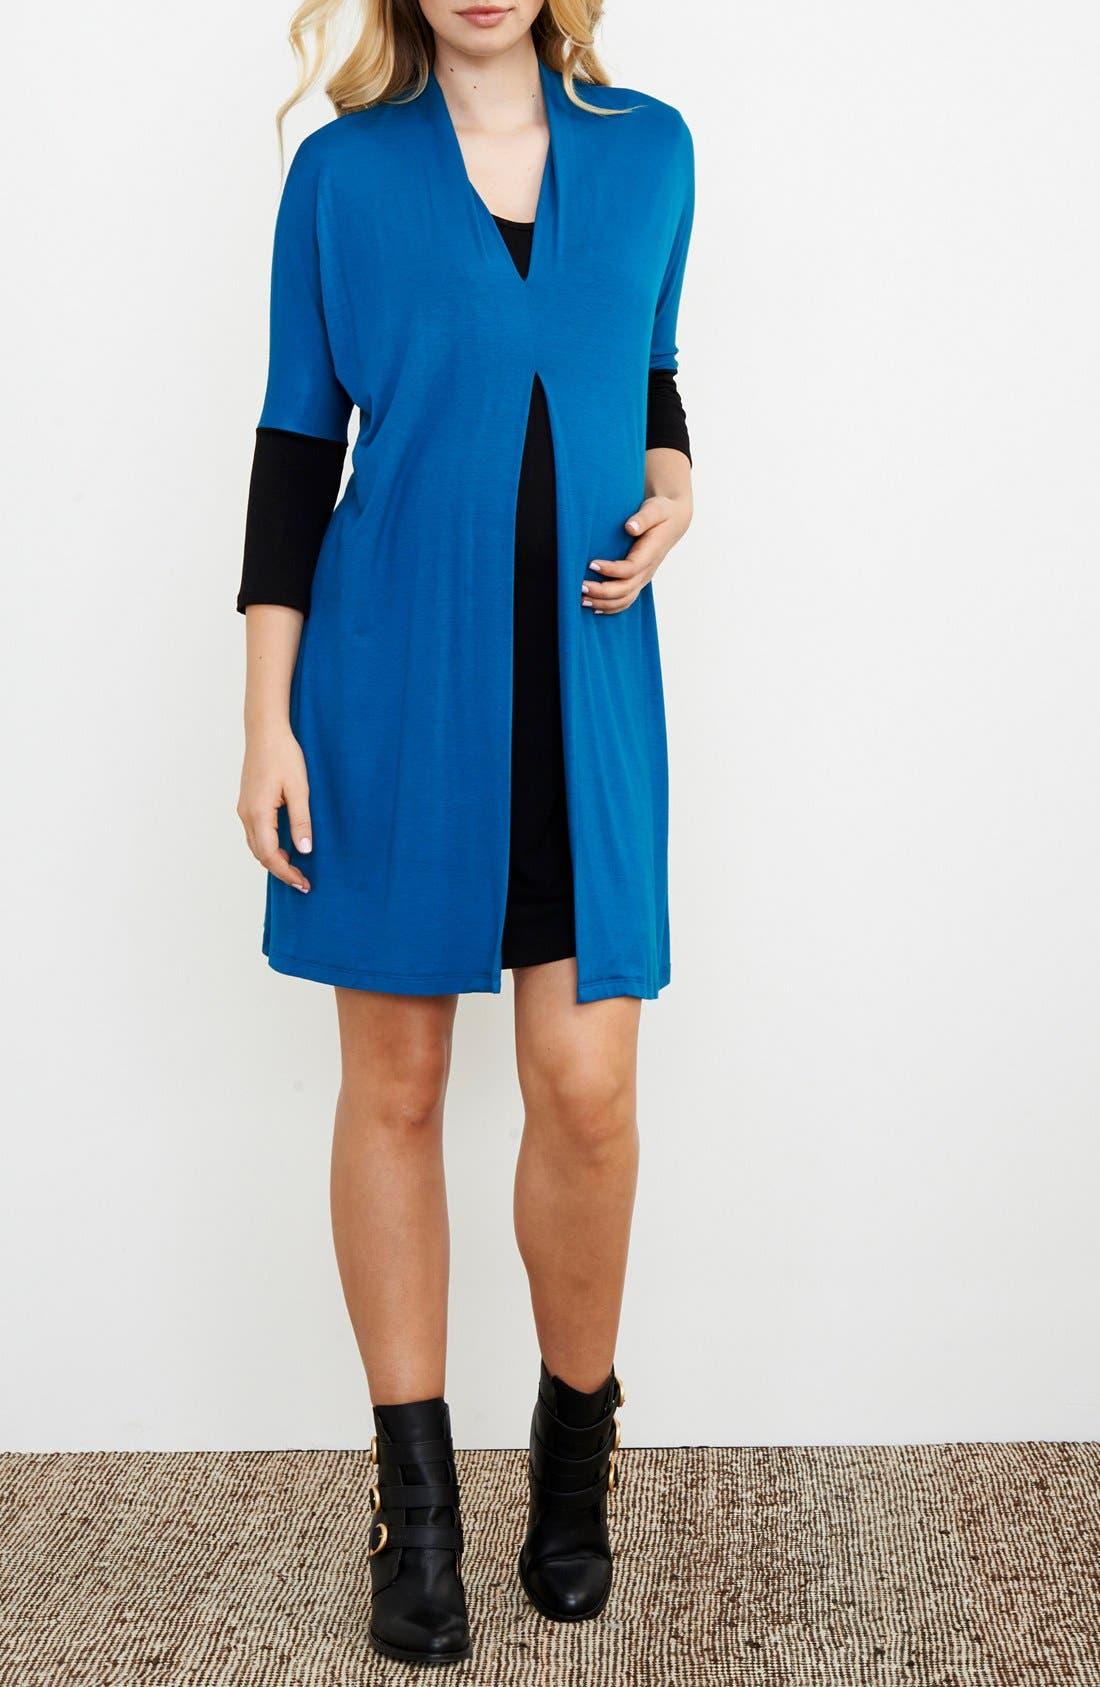 Layered Maternity/Nursing Dress,                         Main,                         color, Teal/ Black